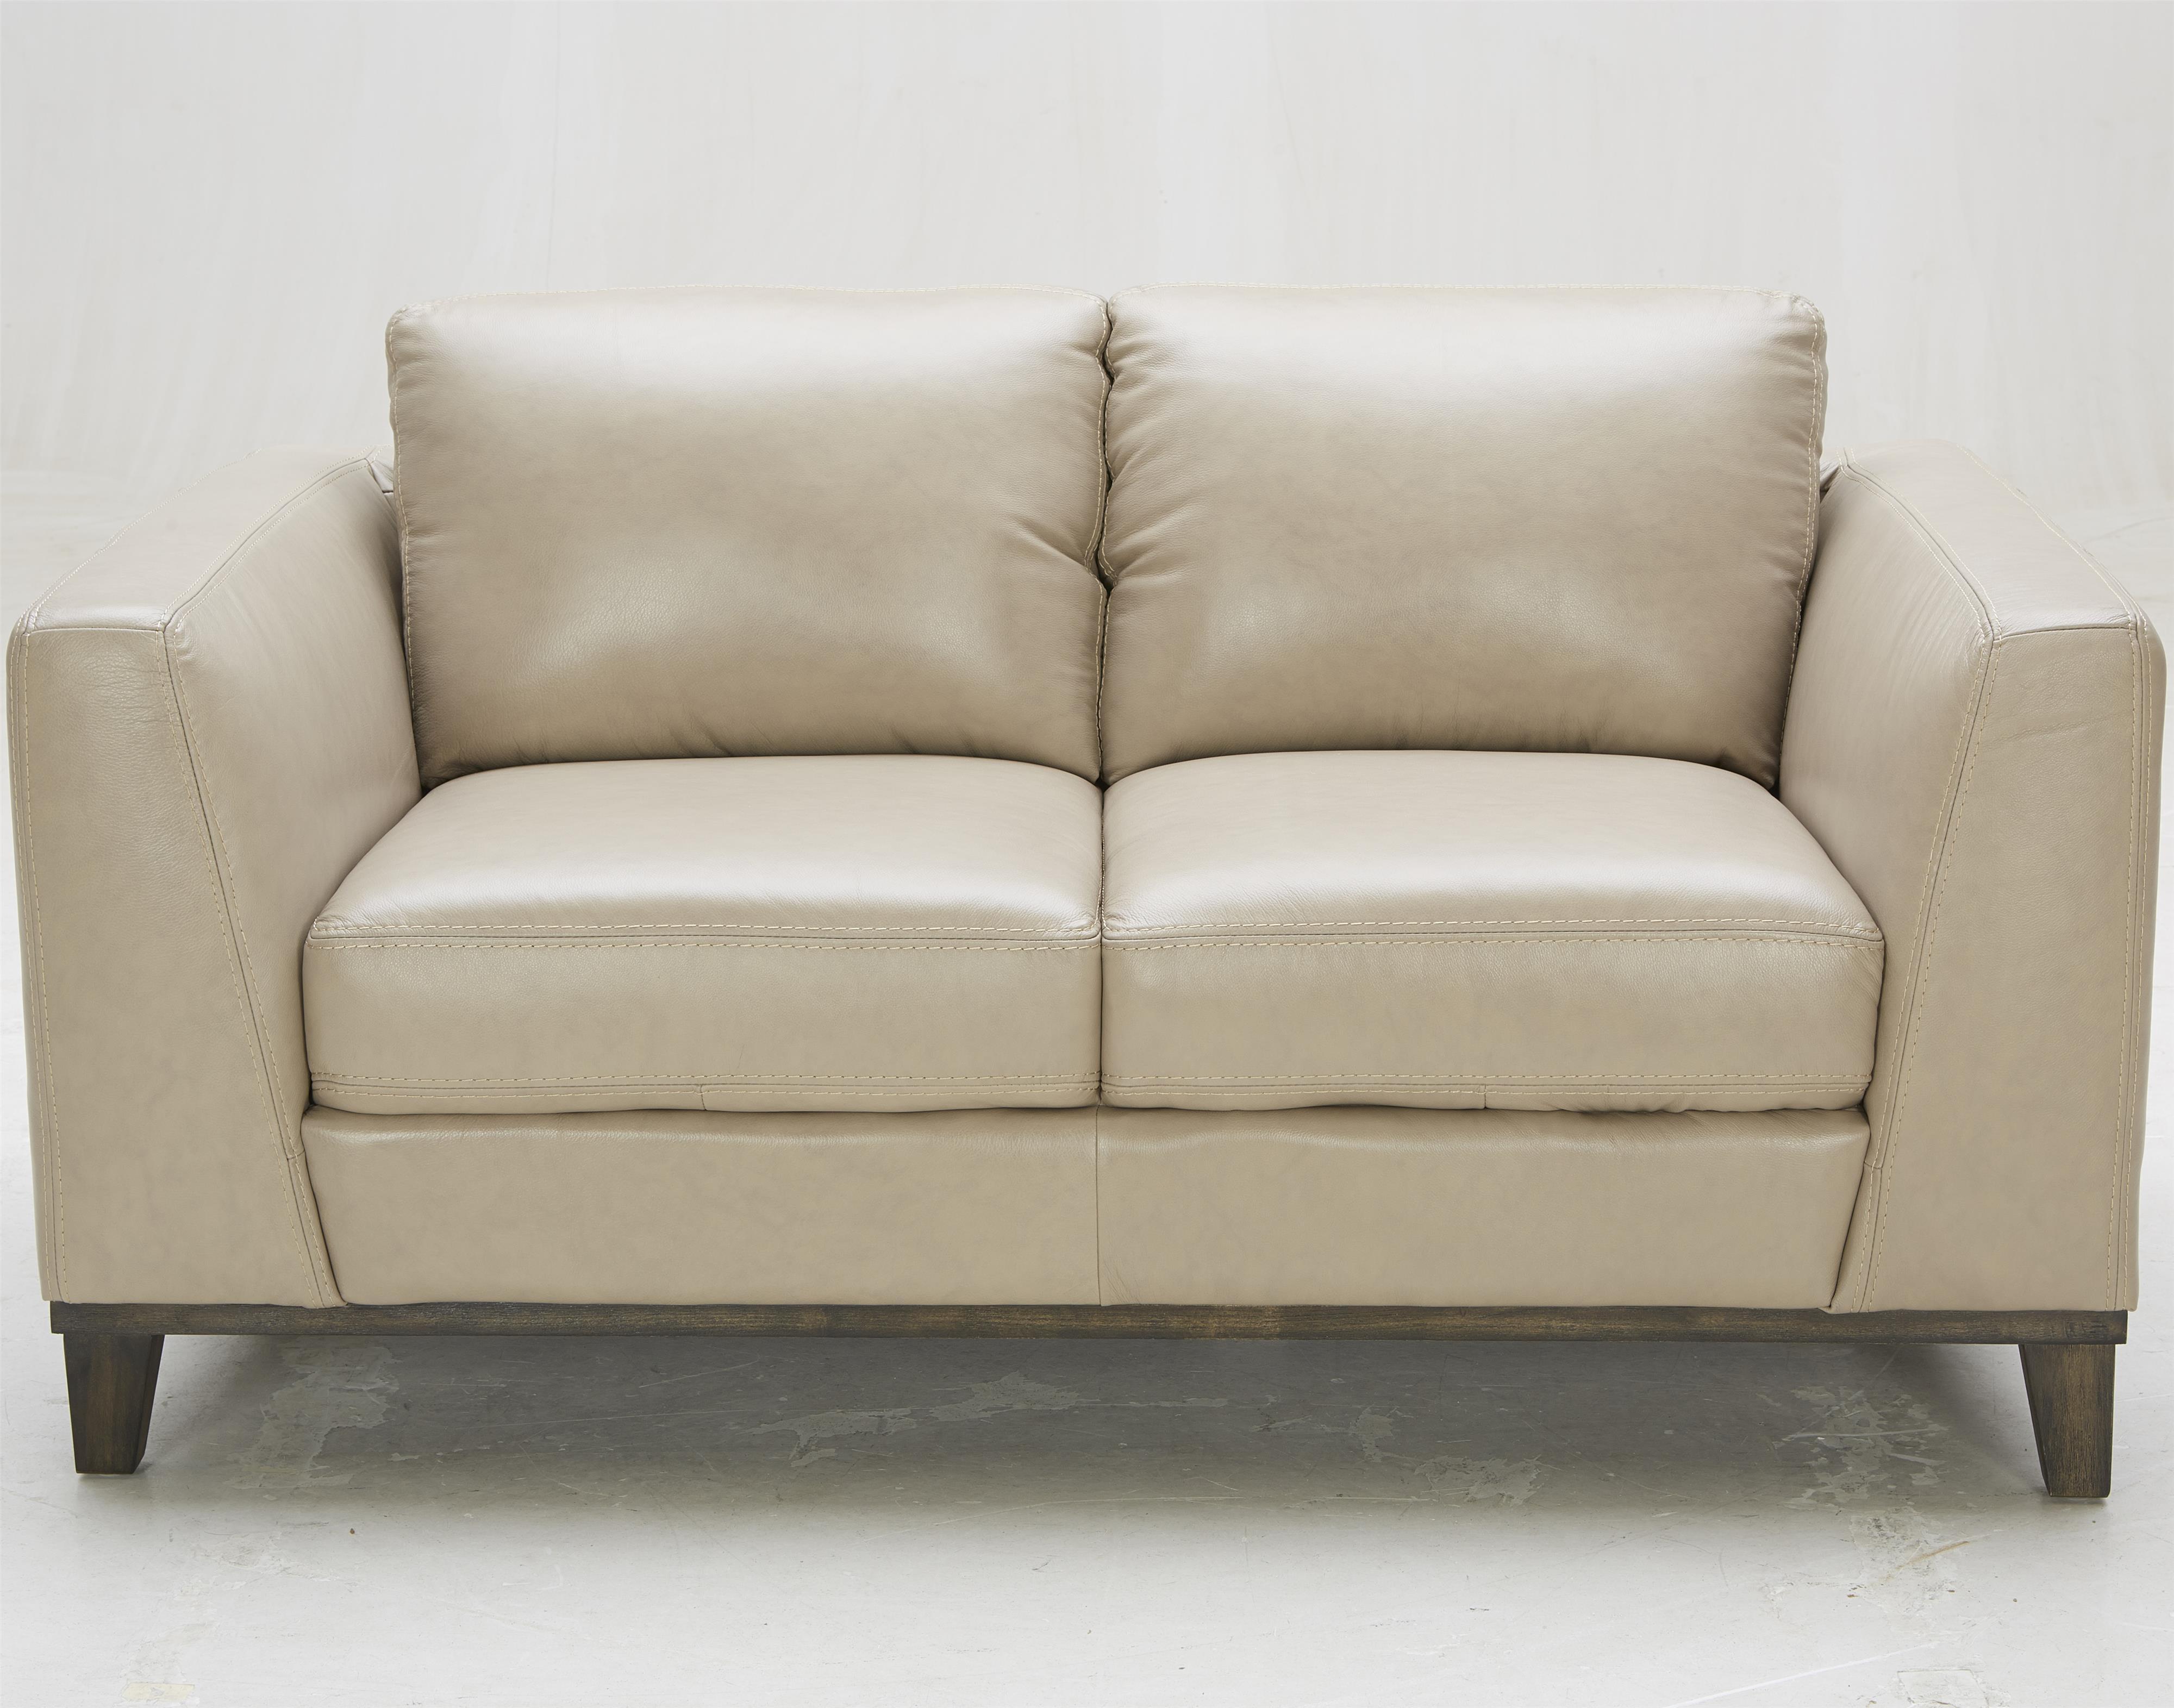 Urban Evolution Corbin Leather Loveseat - Item Number: 1839L-M2826-G030